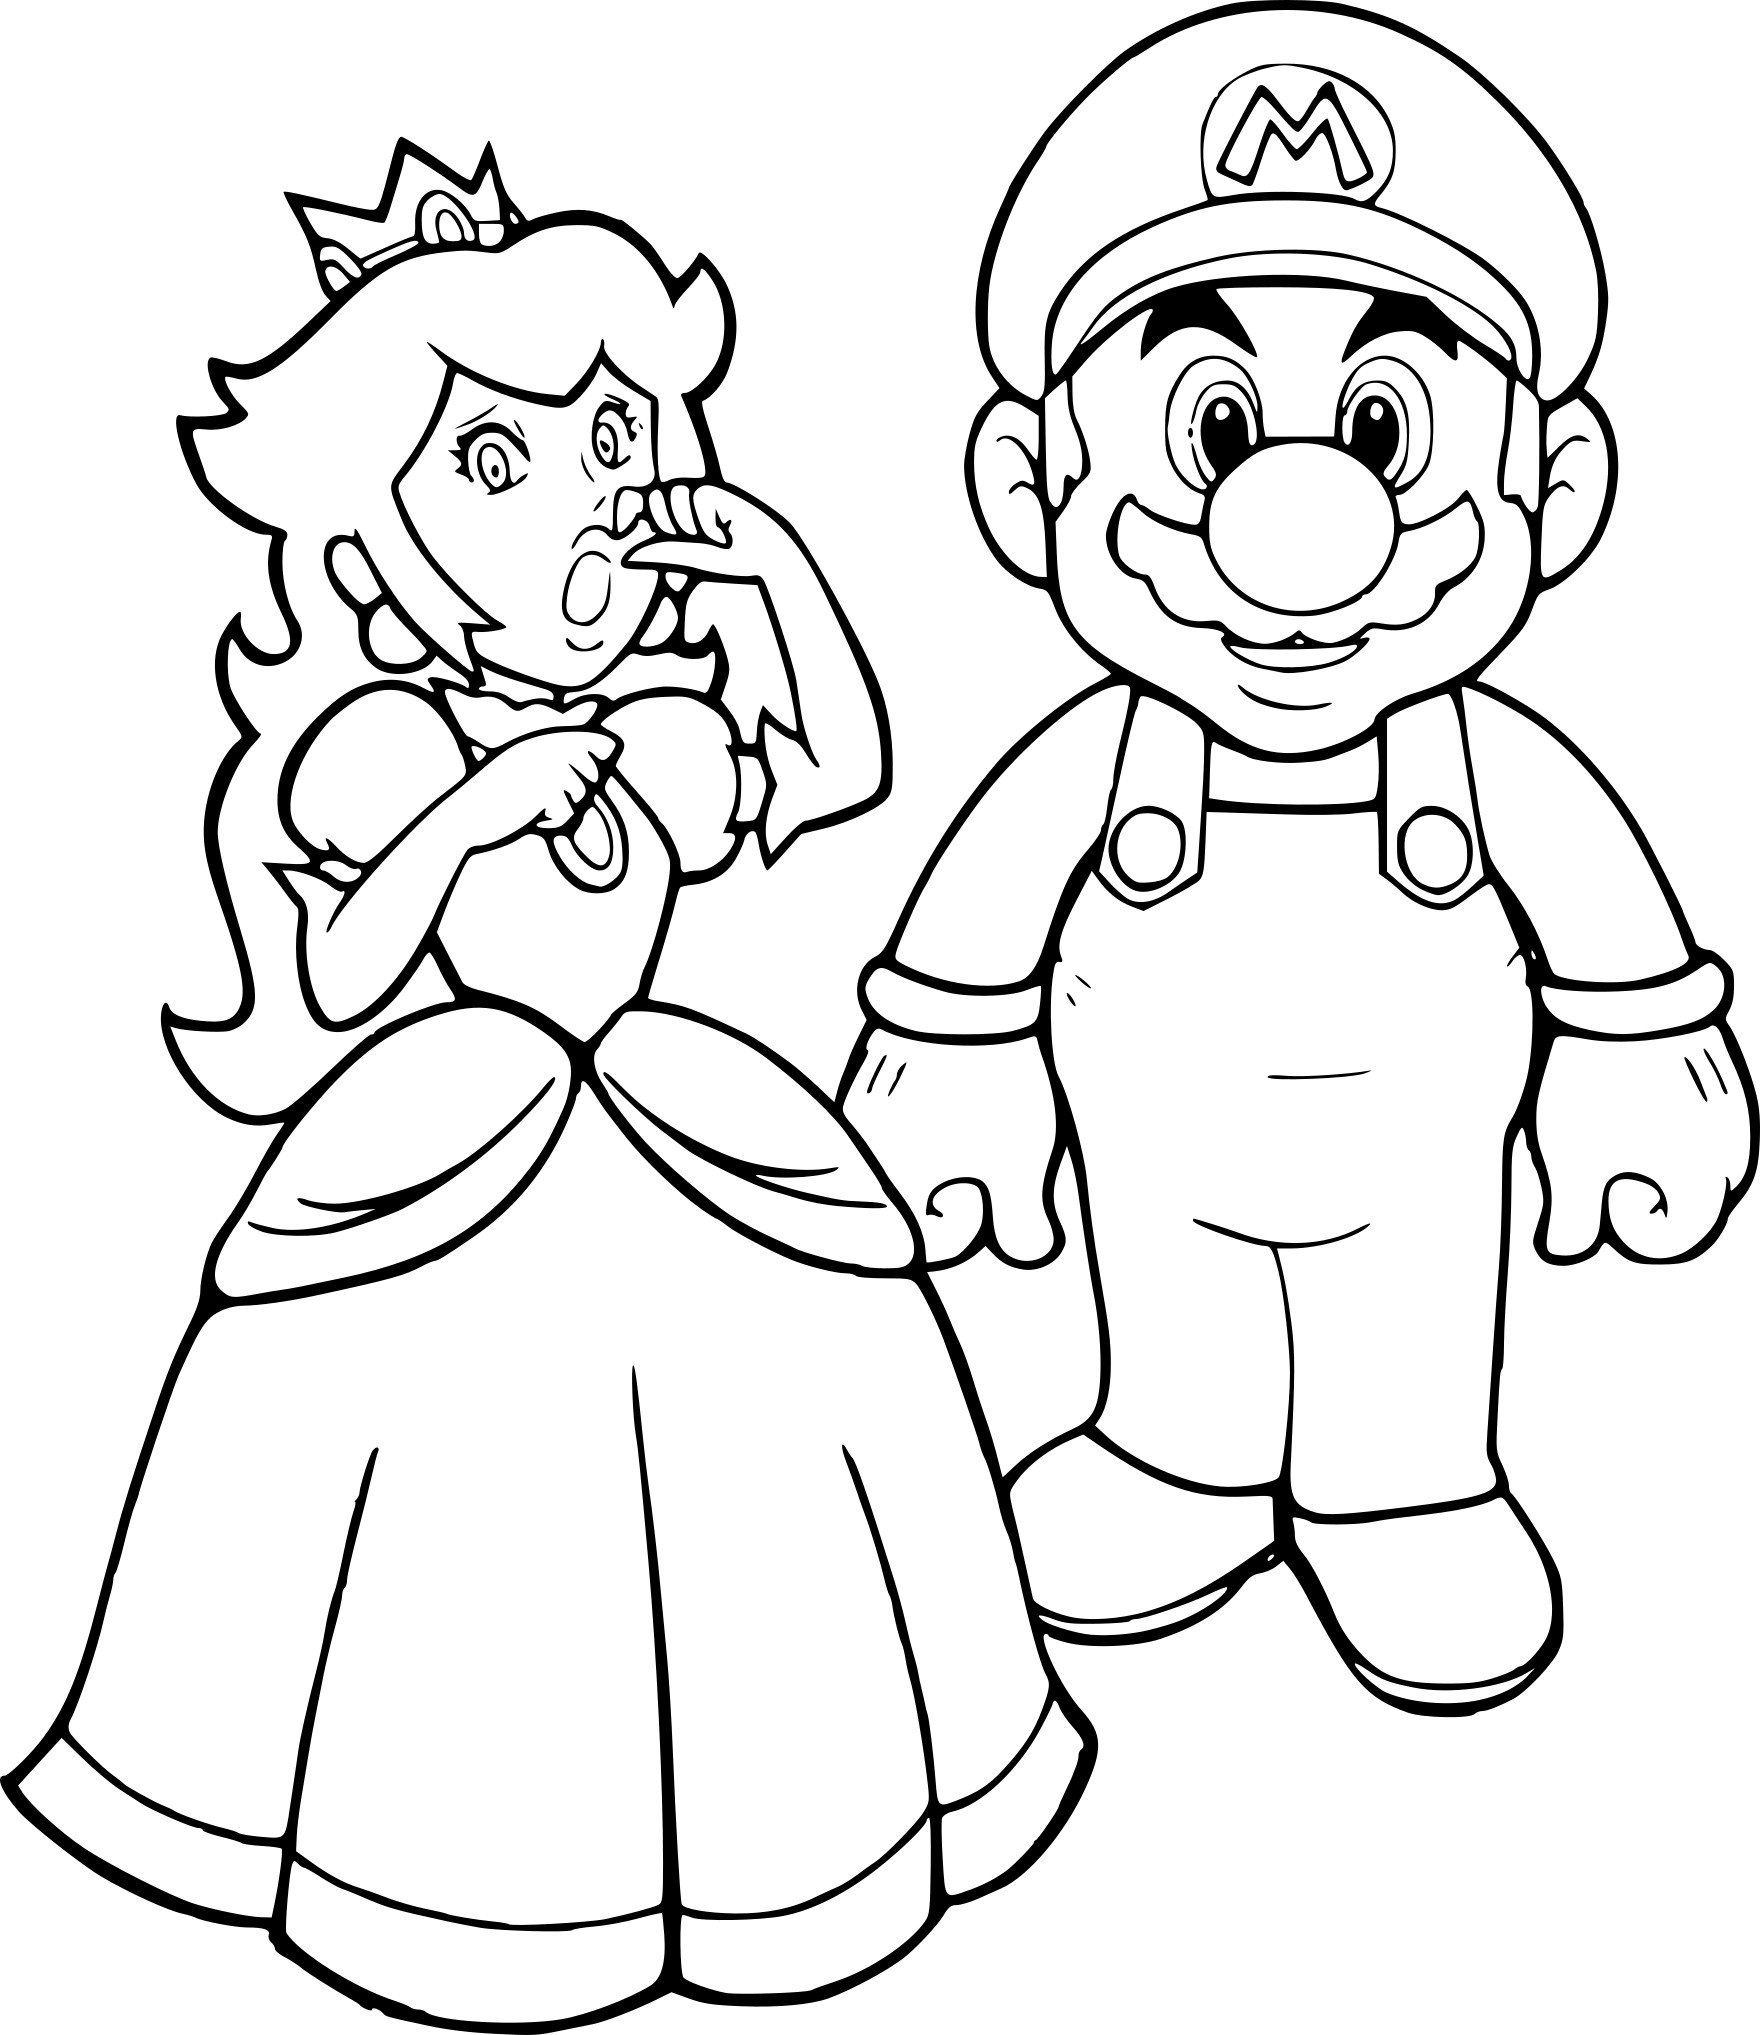 Coloriage Mario Et Peach À Imprimer dedans Coloriage Mario